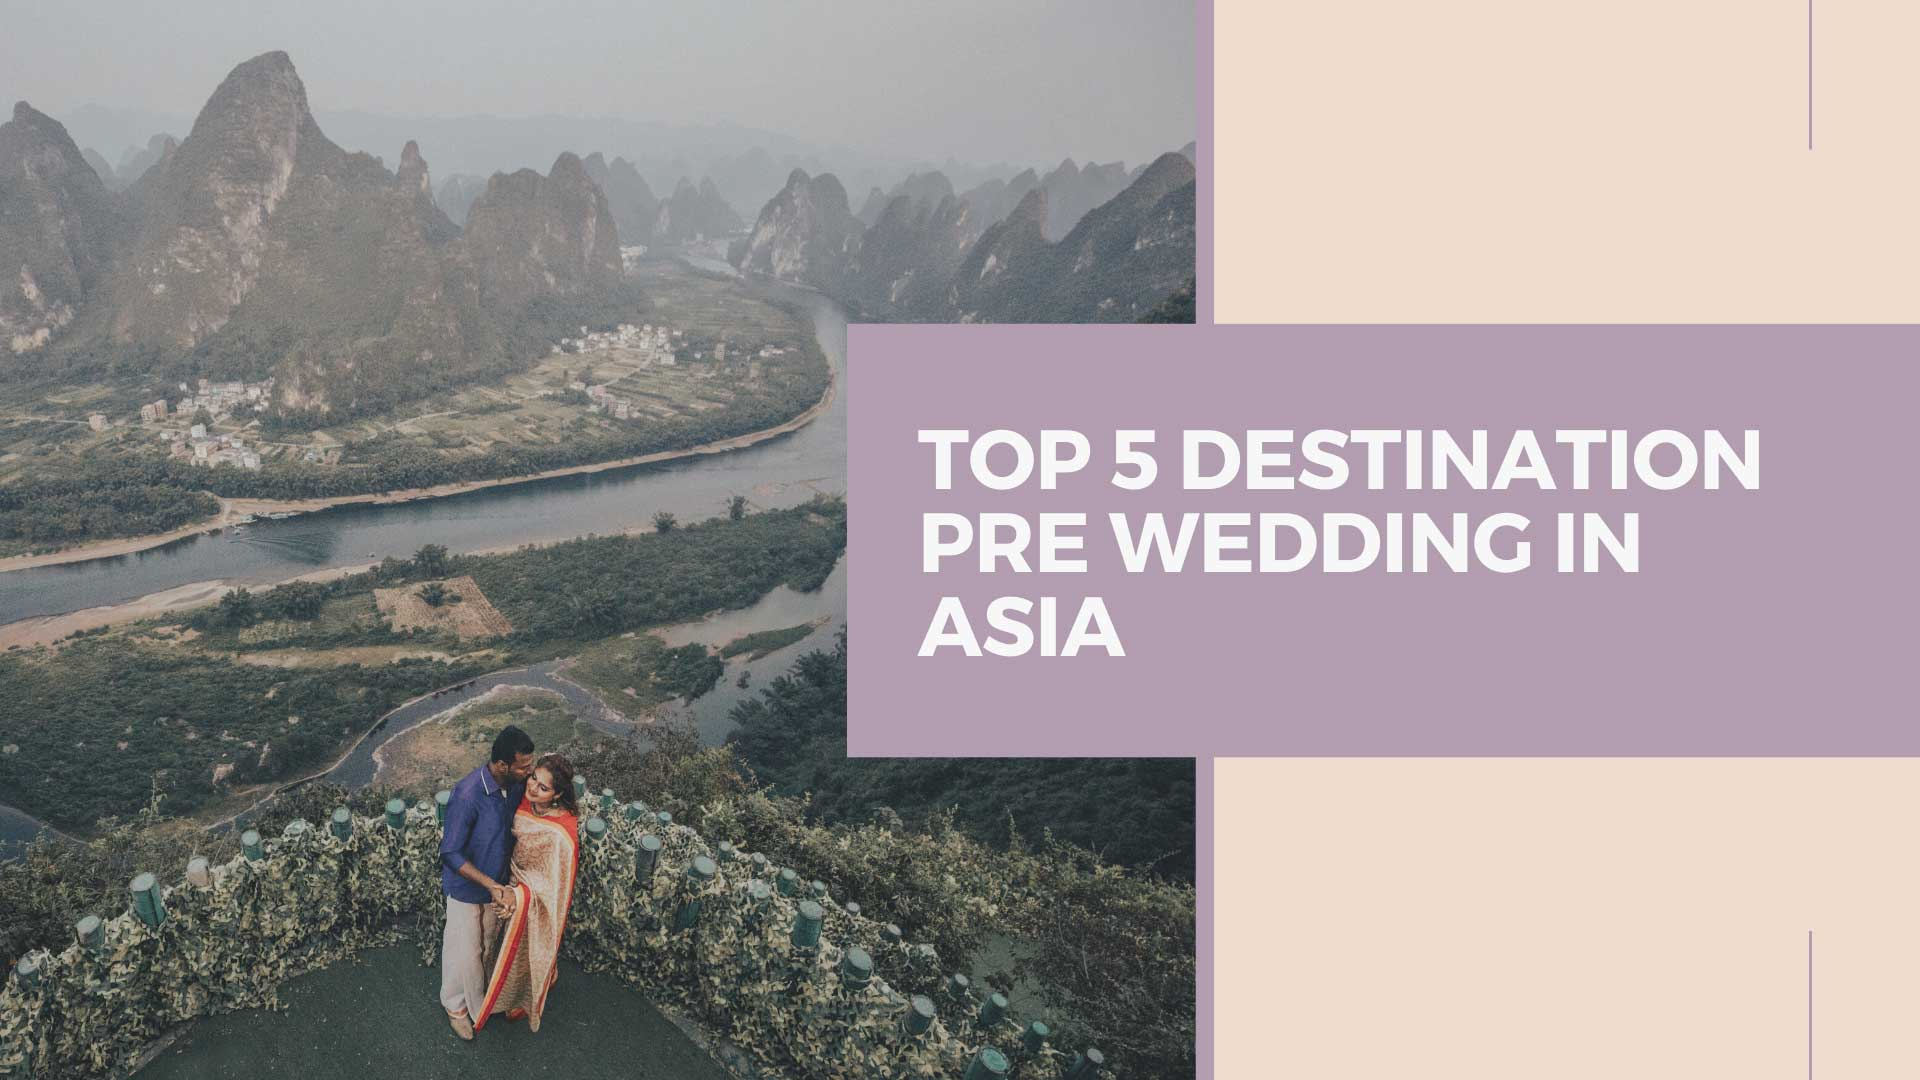 Top 5 Destination Pre Wedding in Asia